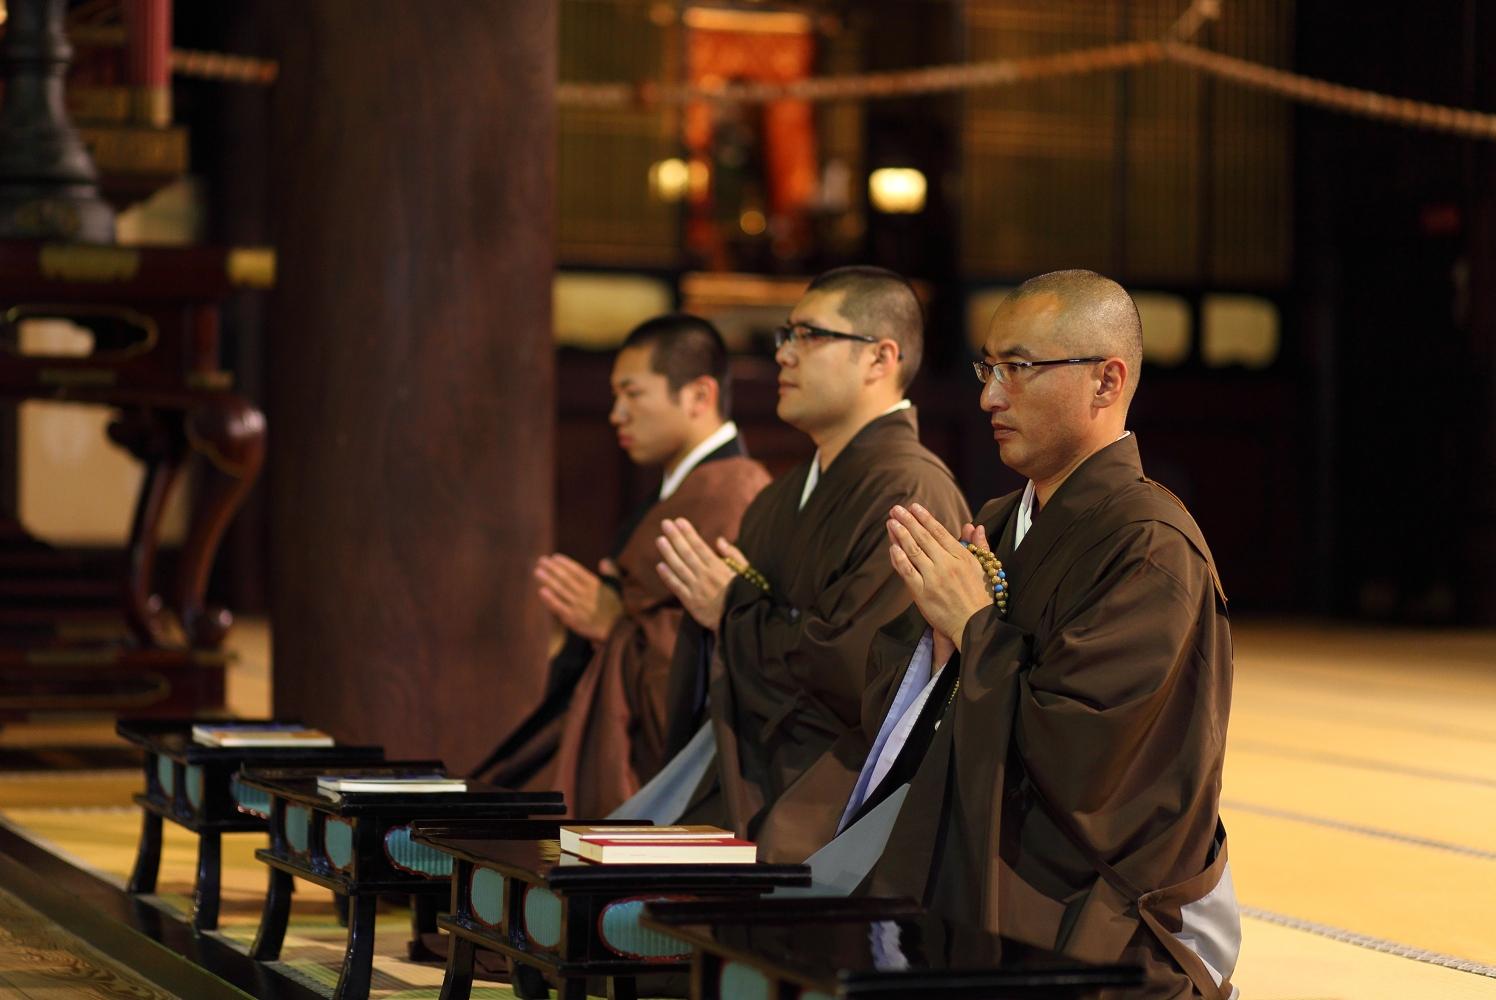 Japão Monges